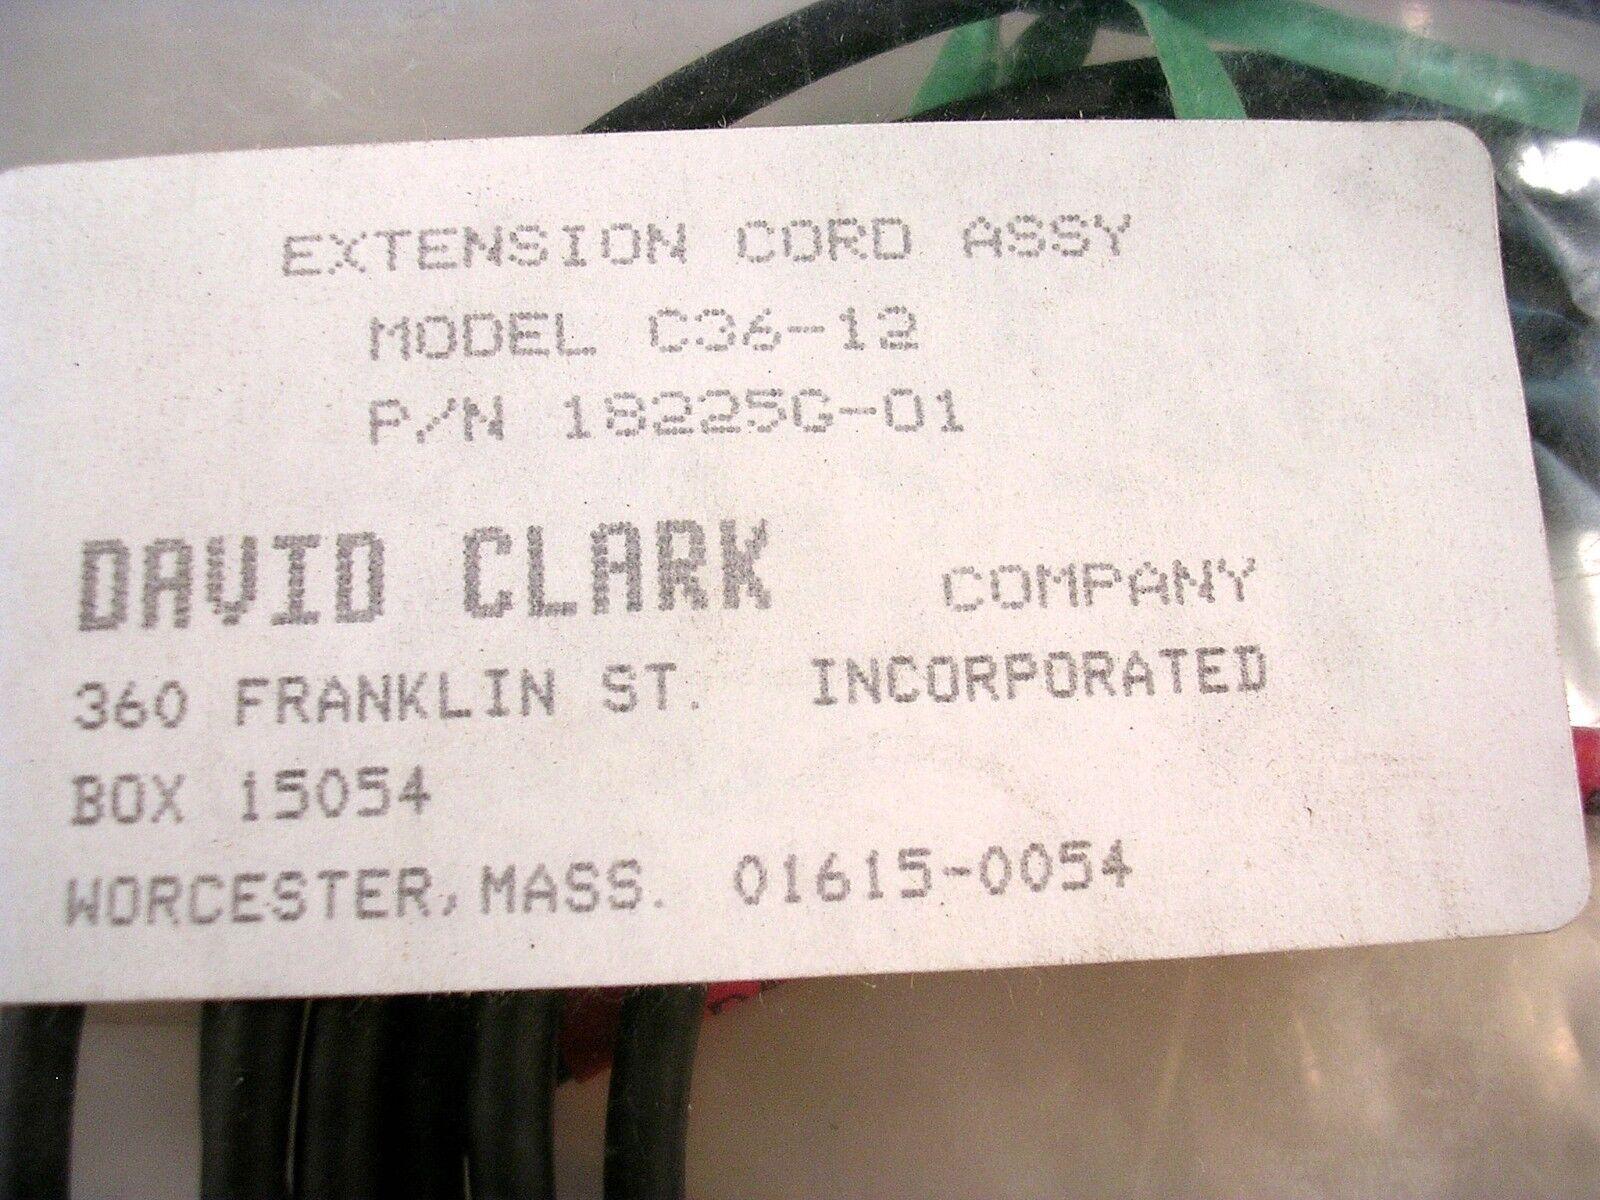 NEW DAVID CLARK EXTENSION CABLE MODEL C36-12